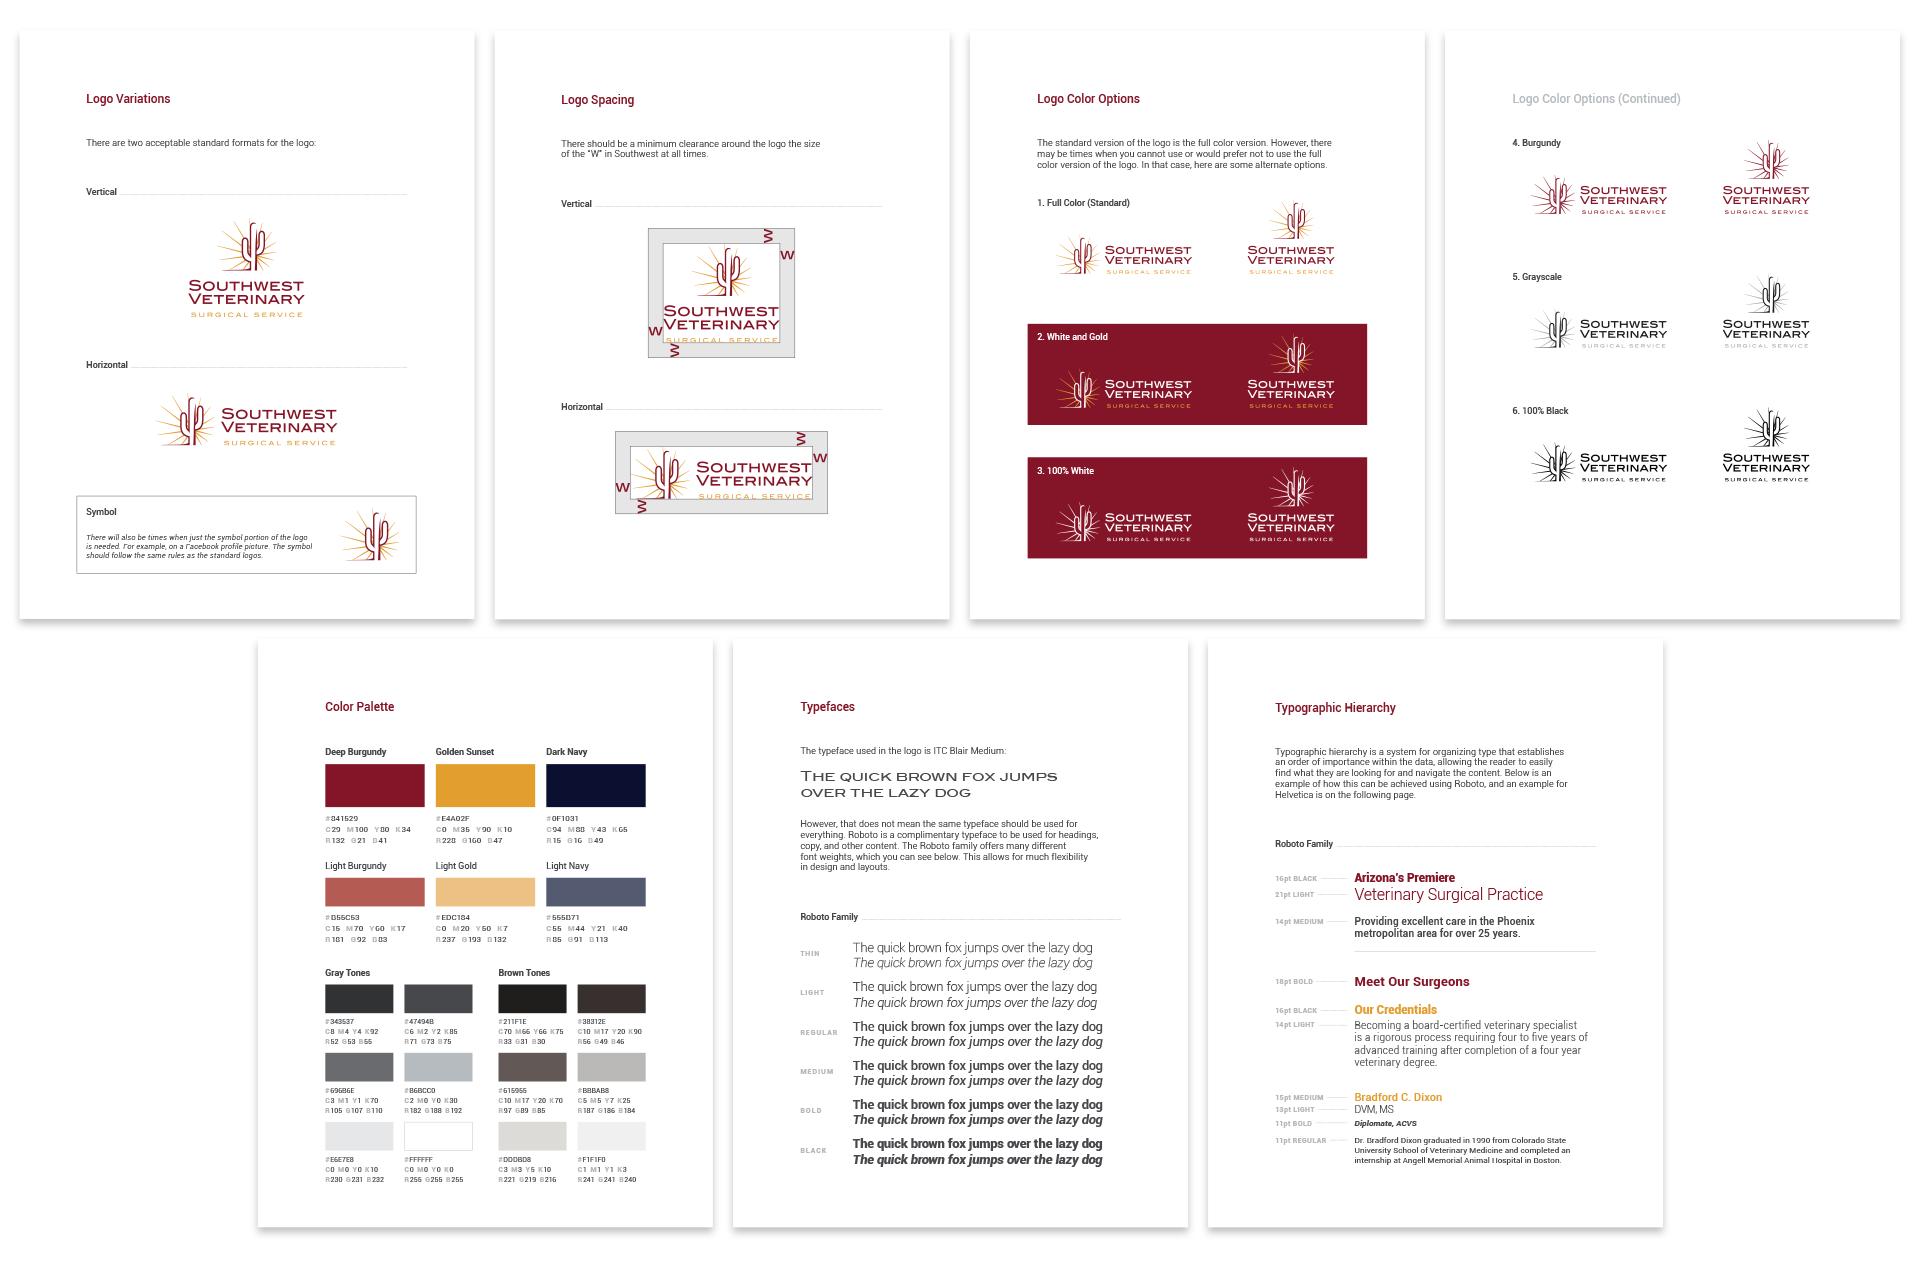 Brand Standards Guide Design